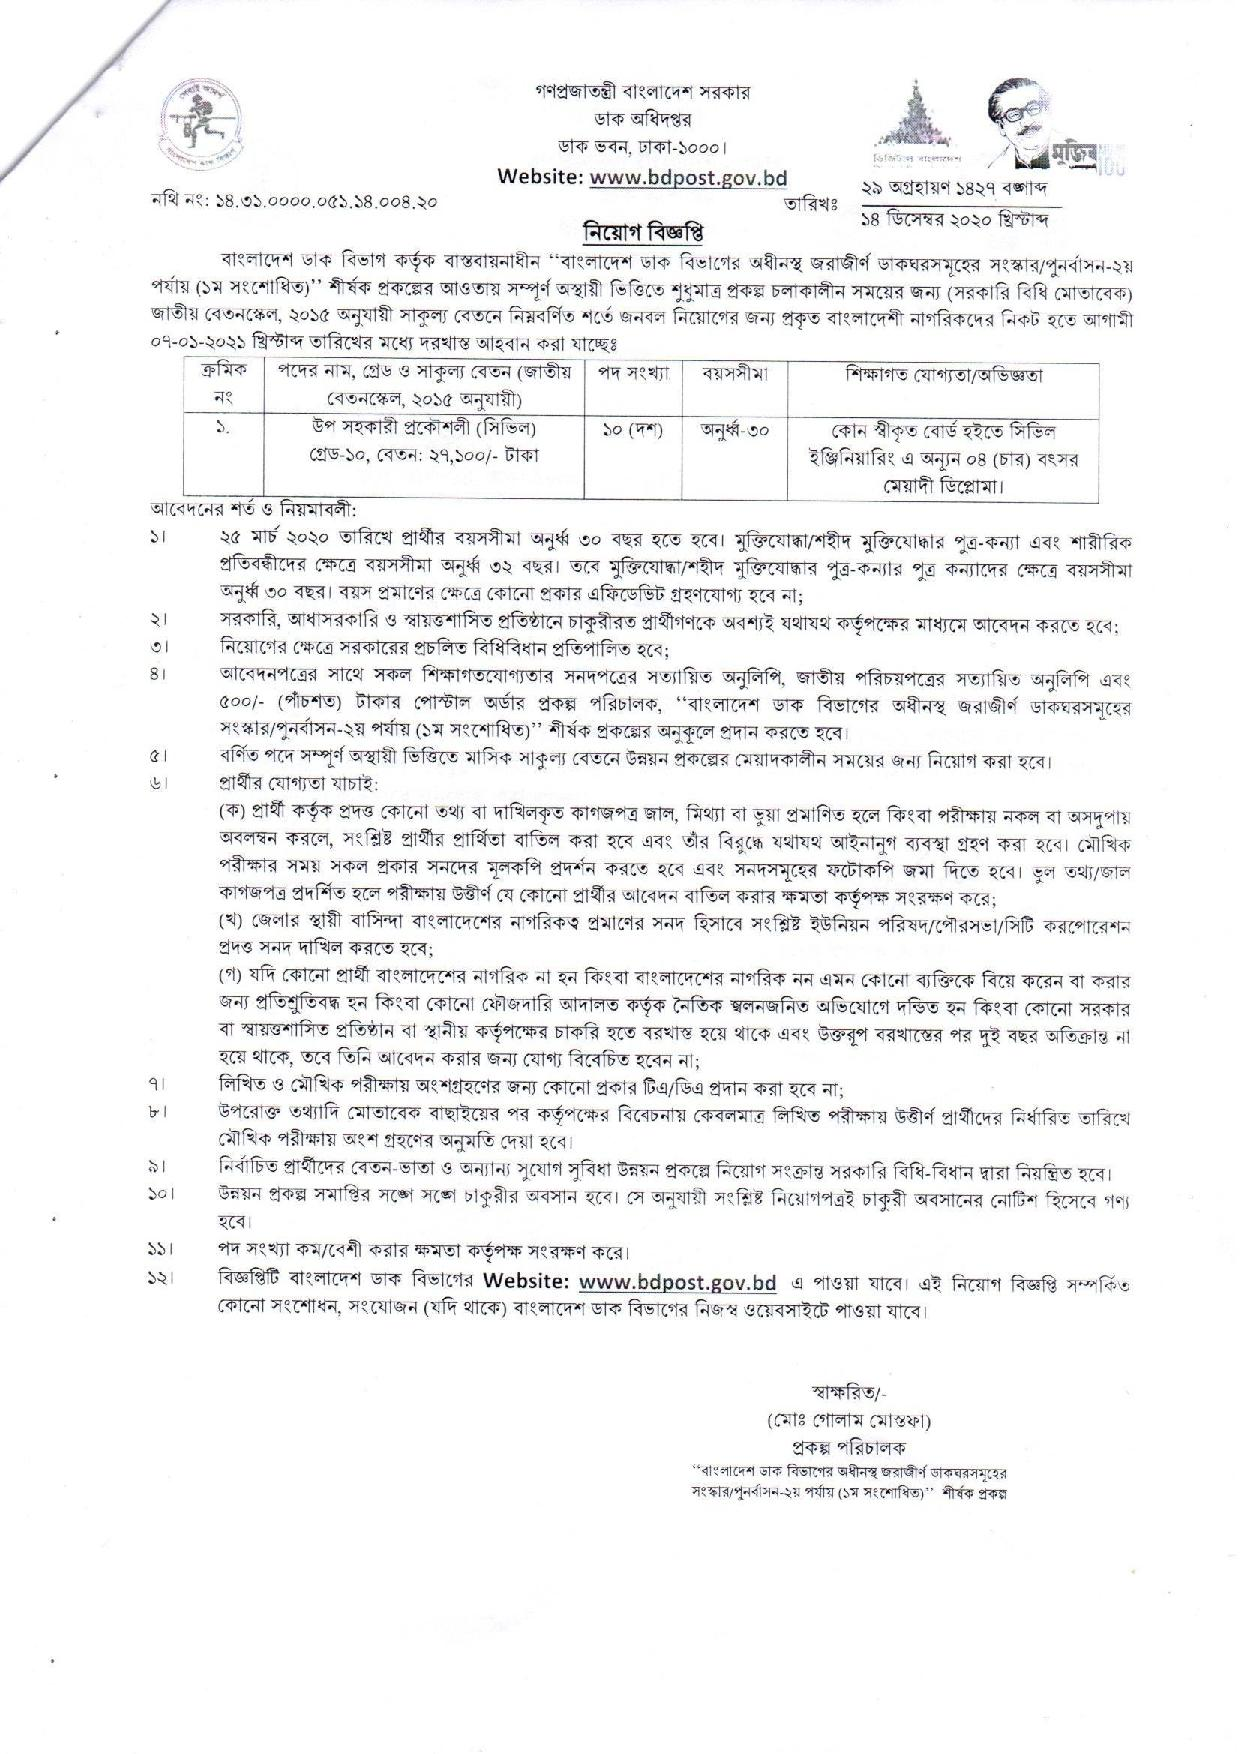 Post Office Job Circular 2021 | Directorate Of Posts | BD Govt Job 1